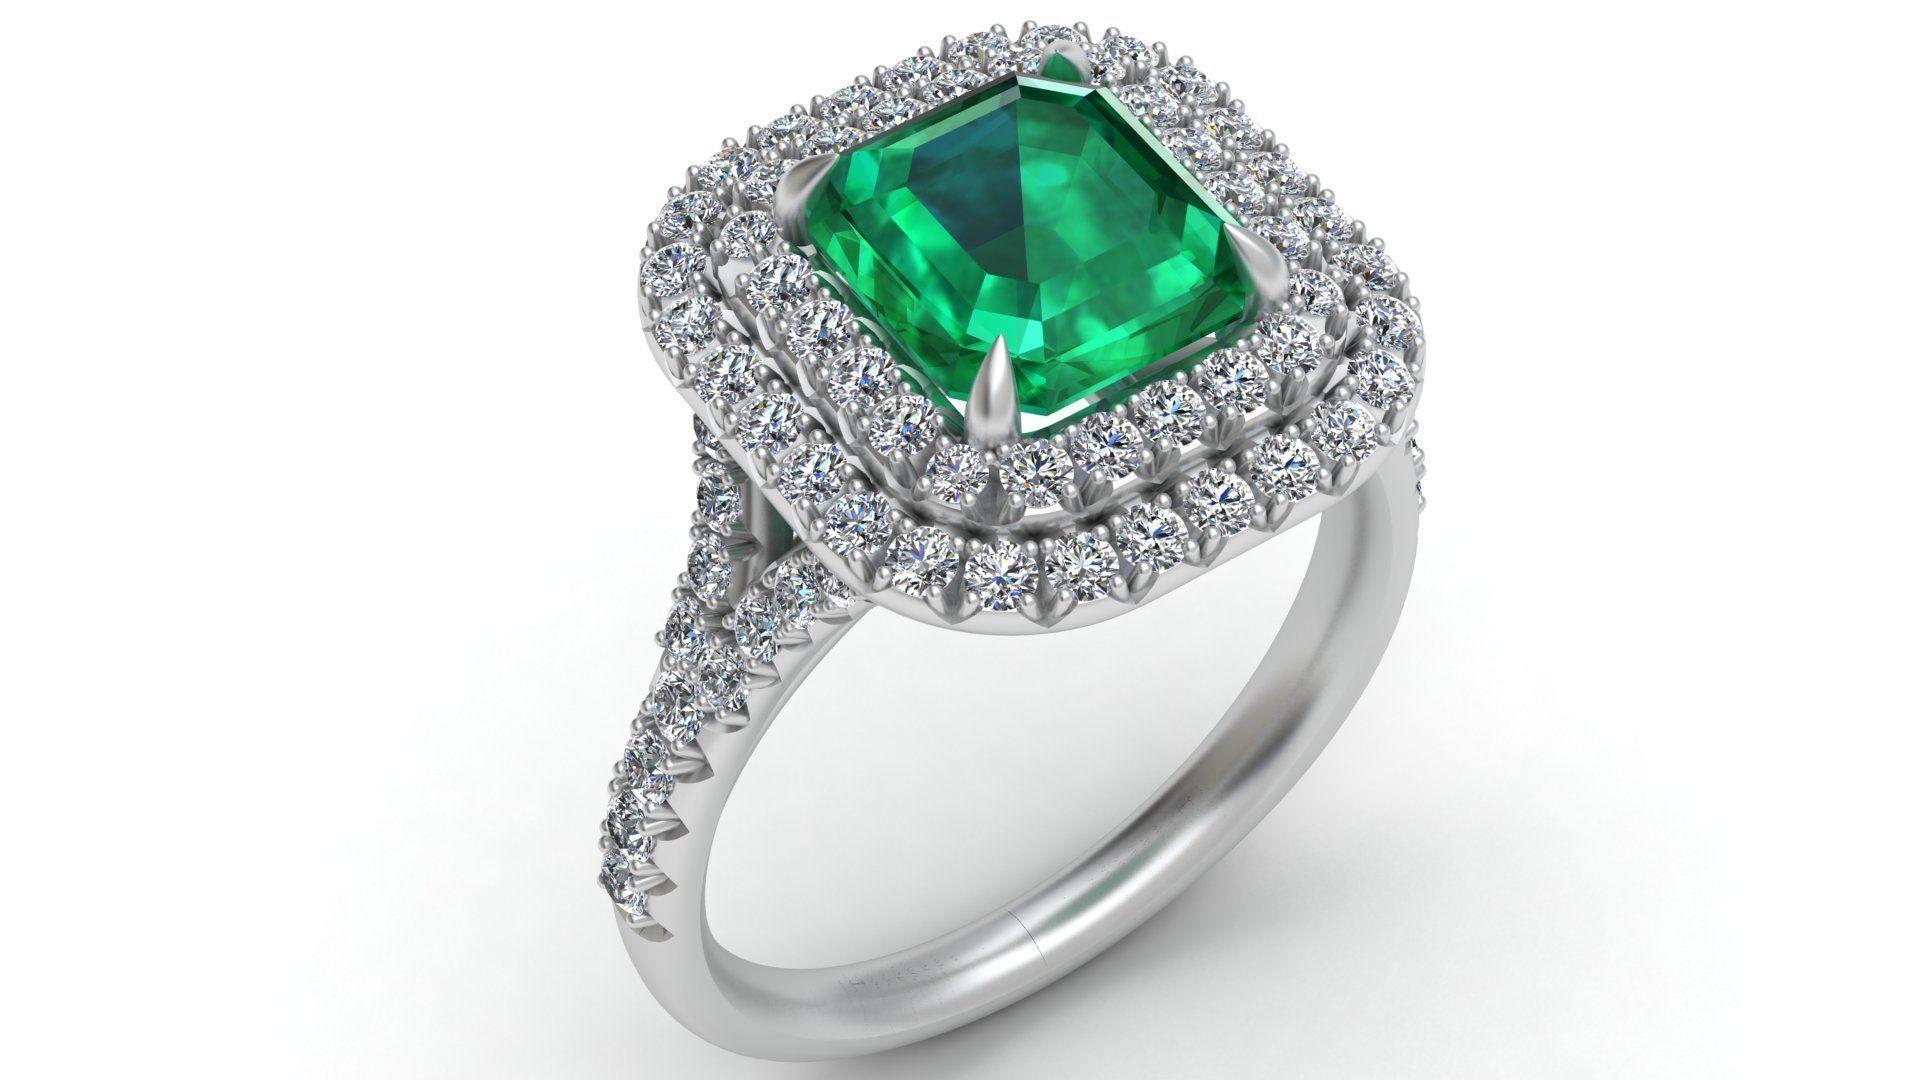 Tiffany Emerald Diamond Gold Engagement Ring